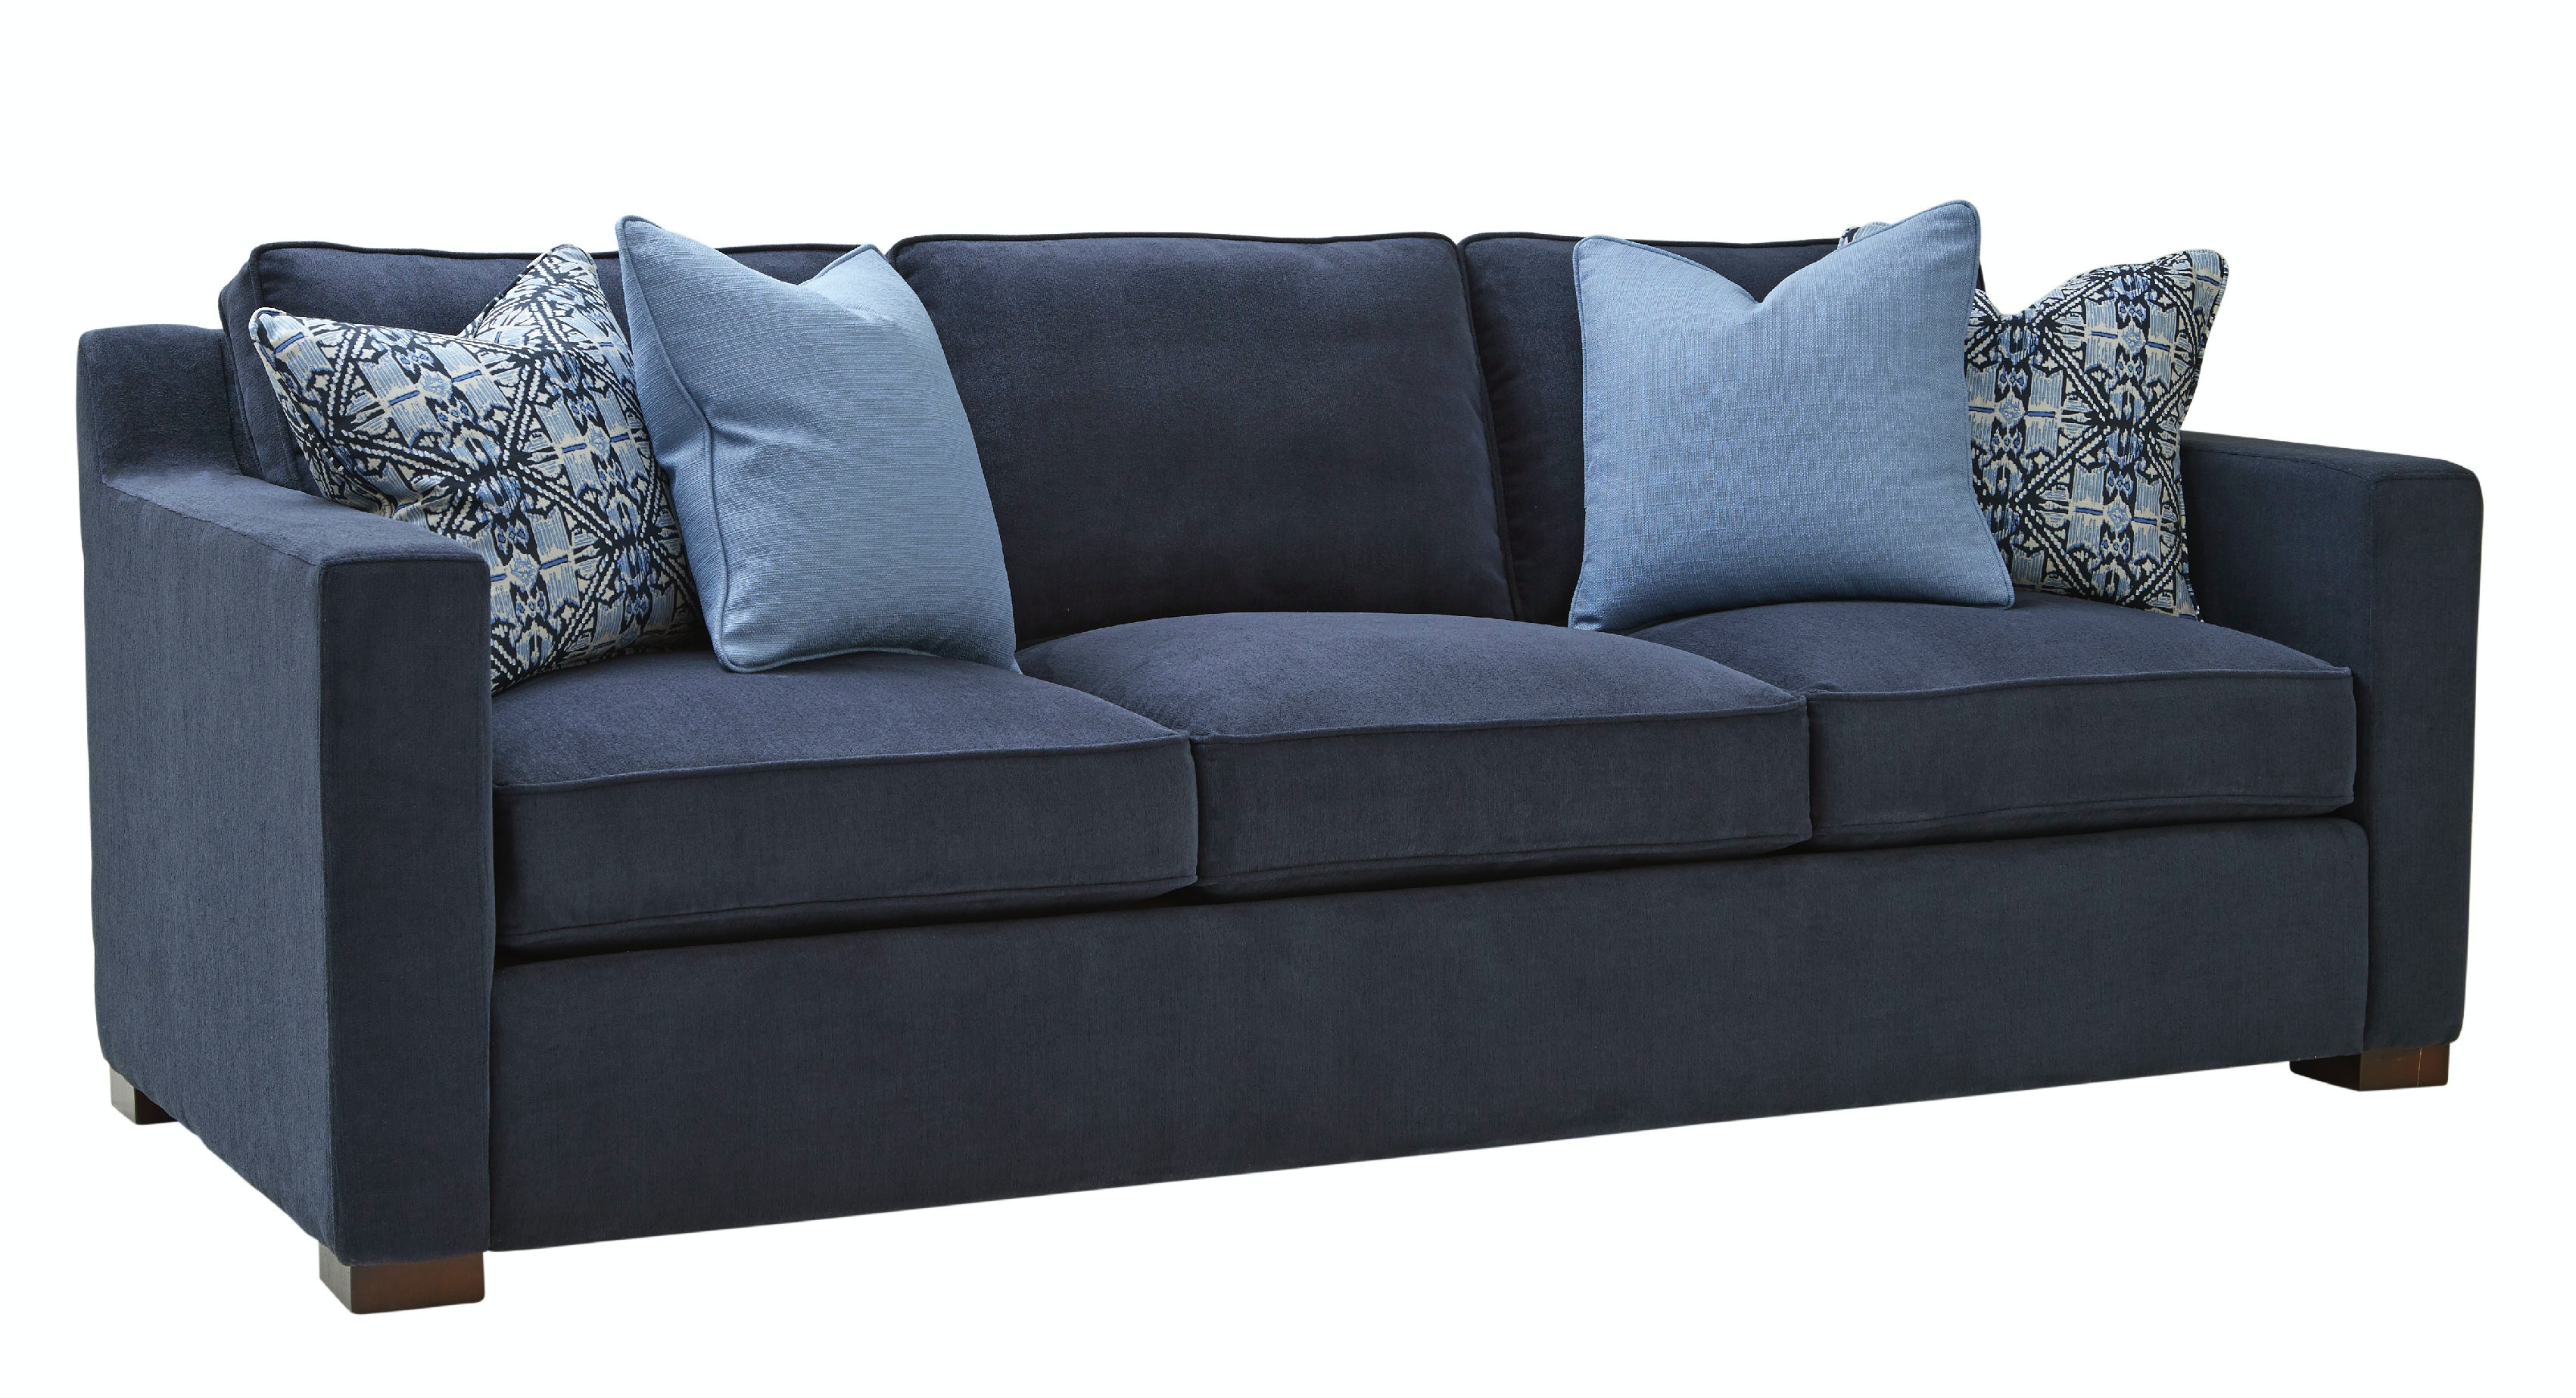 ashley furniture palmer sofa cozy pinterest in oracle hacienda nebraska